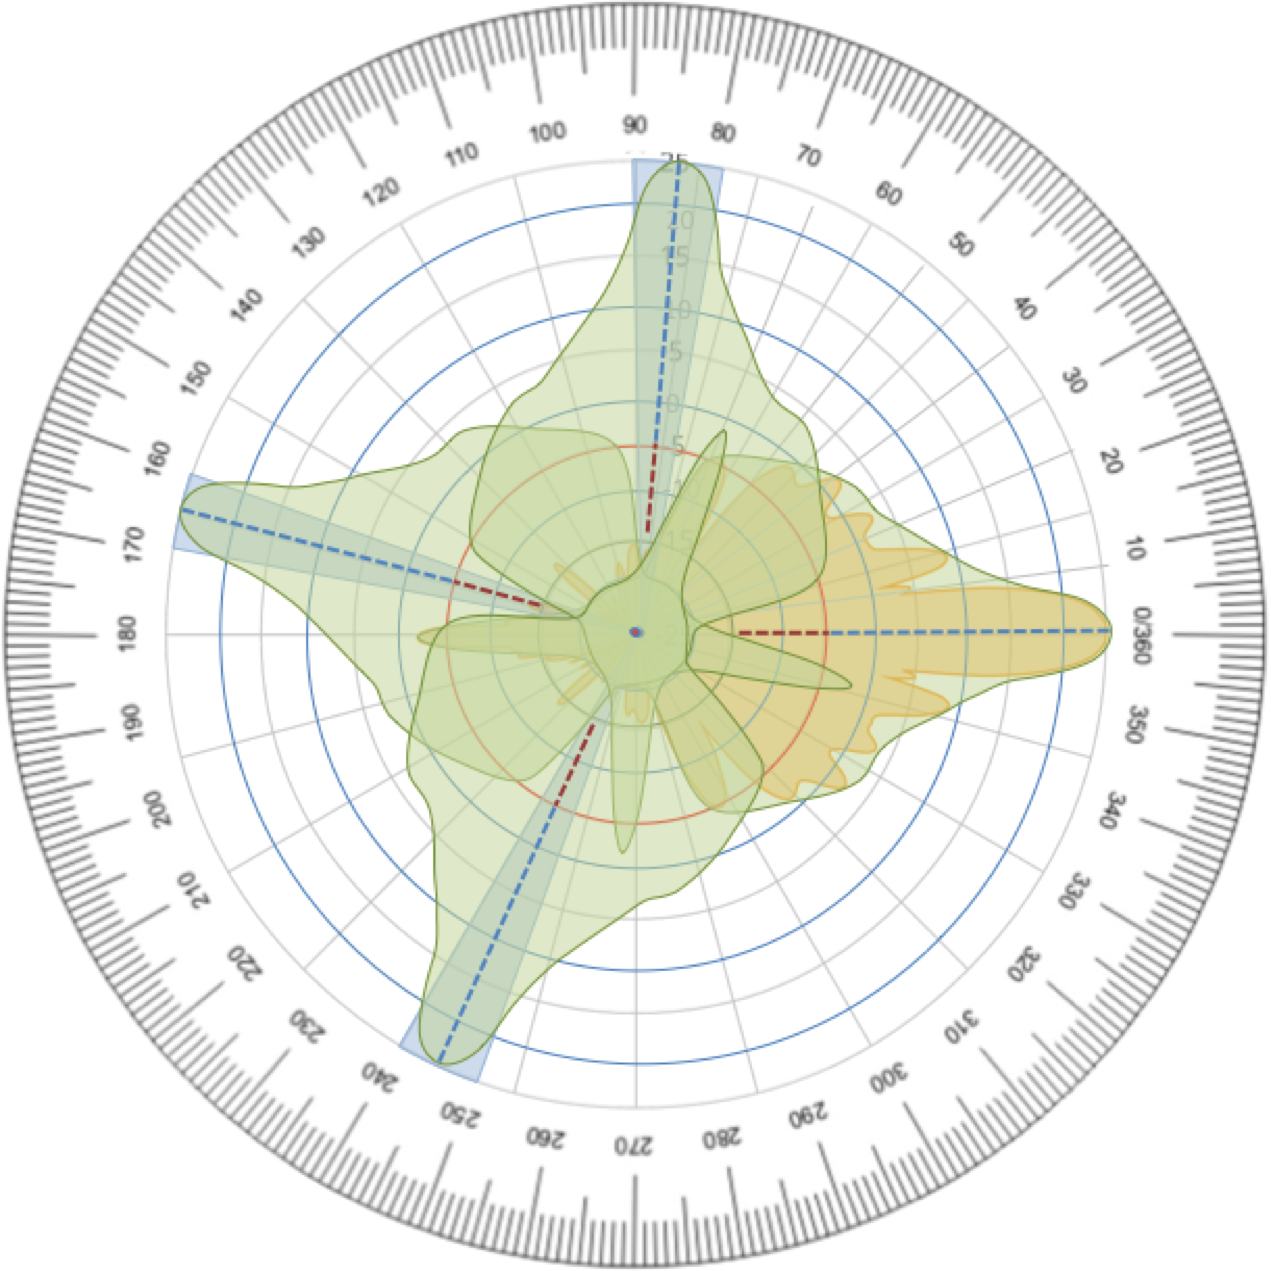 tdma-whitepaper-Figure-16.png